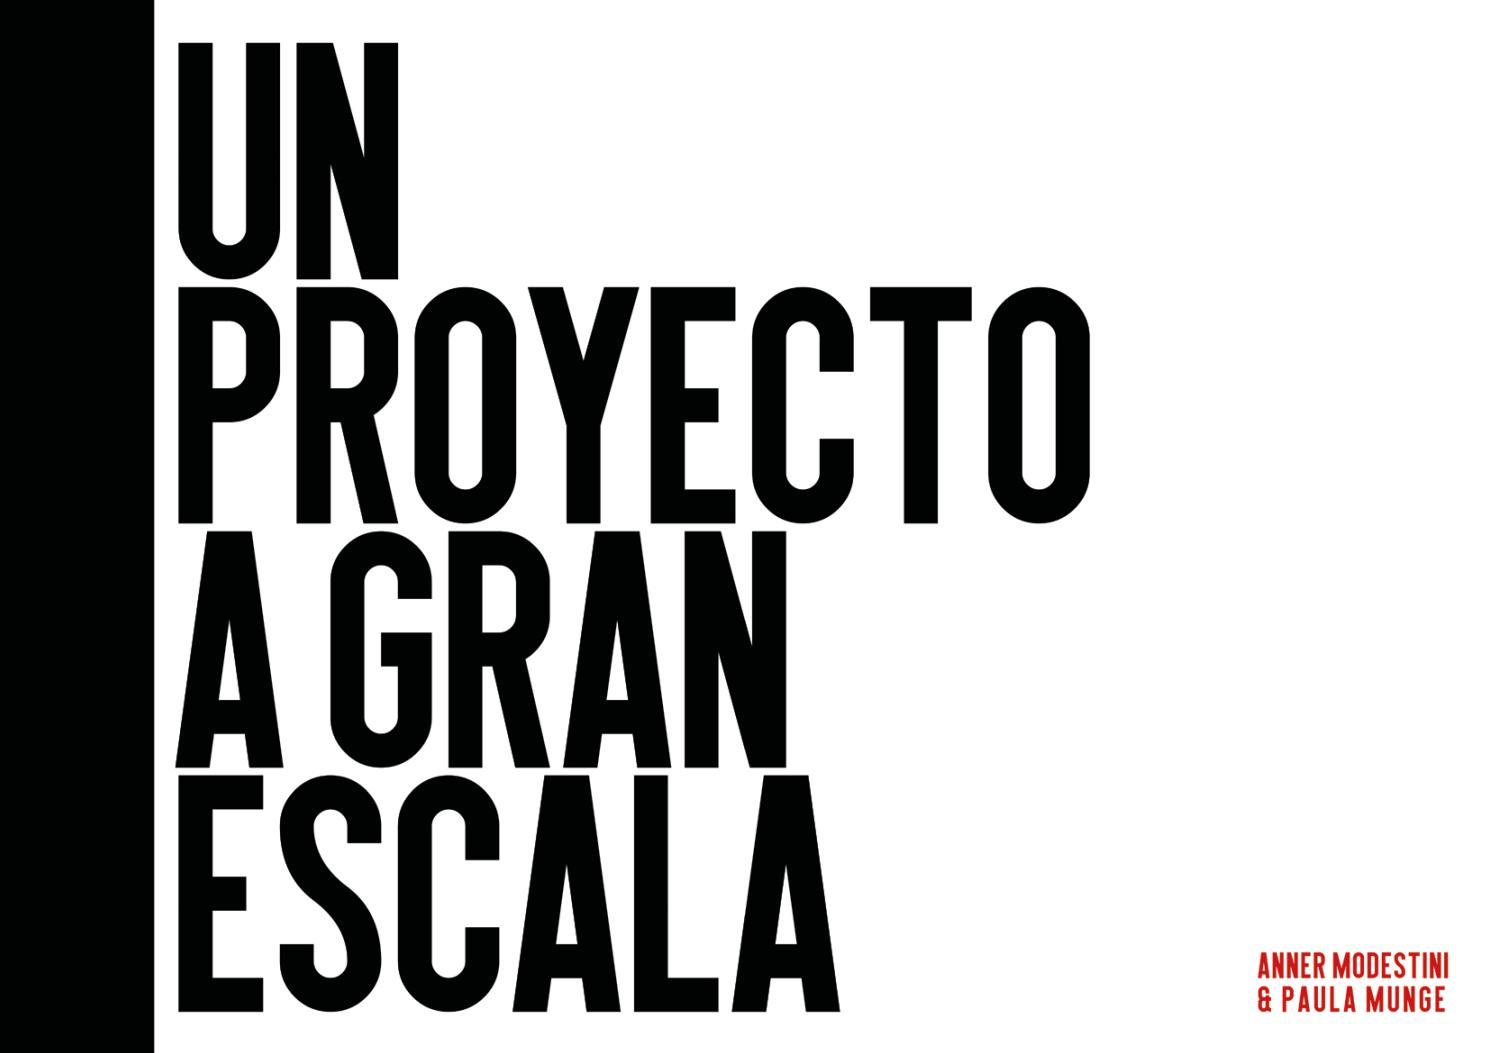 Un proyecto a gran escala by Paula Munge - issuu